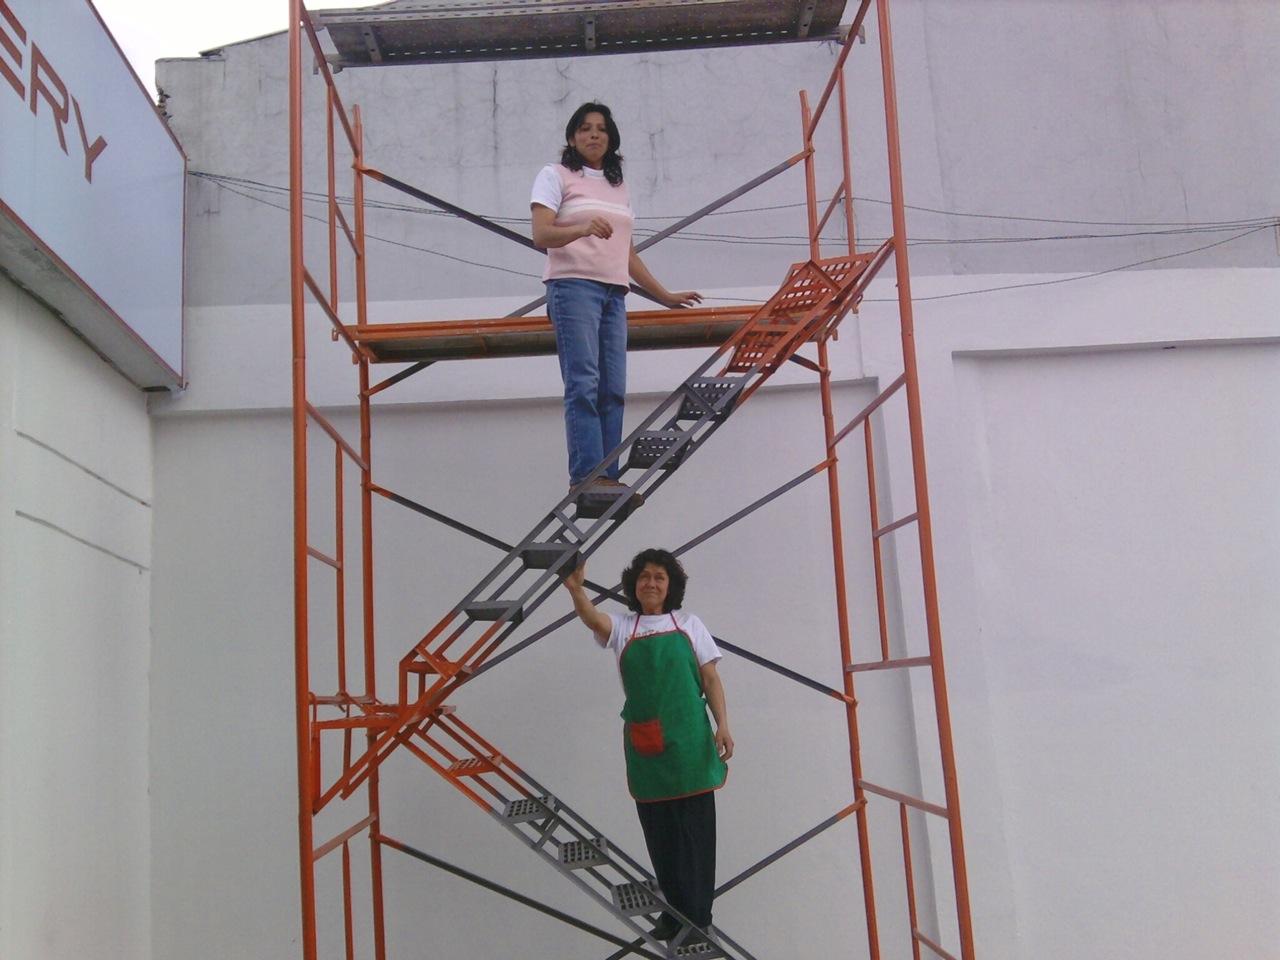 Fotos escalera para obra 018 alquiler de andamios - Alquiler de escaleras ...